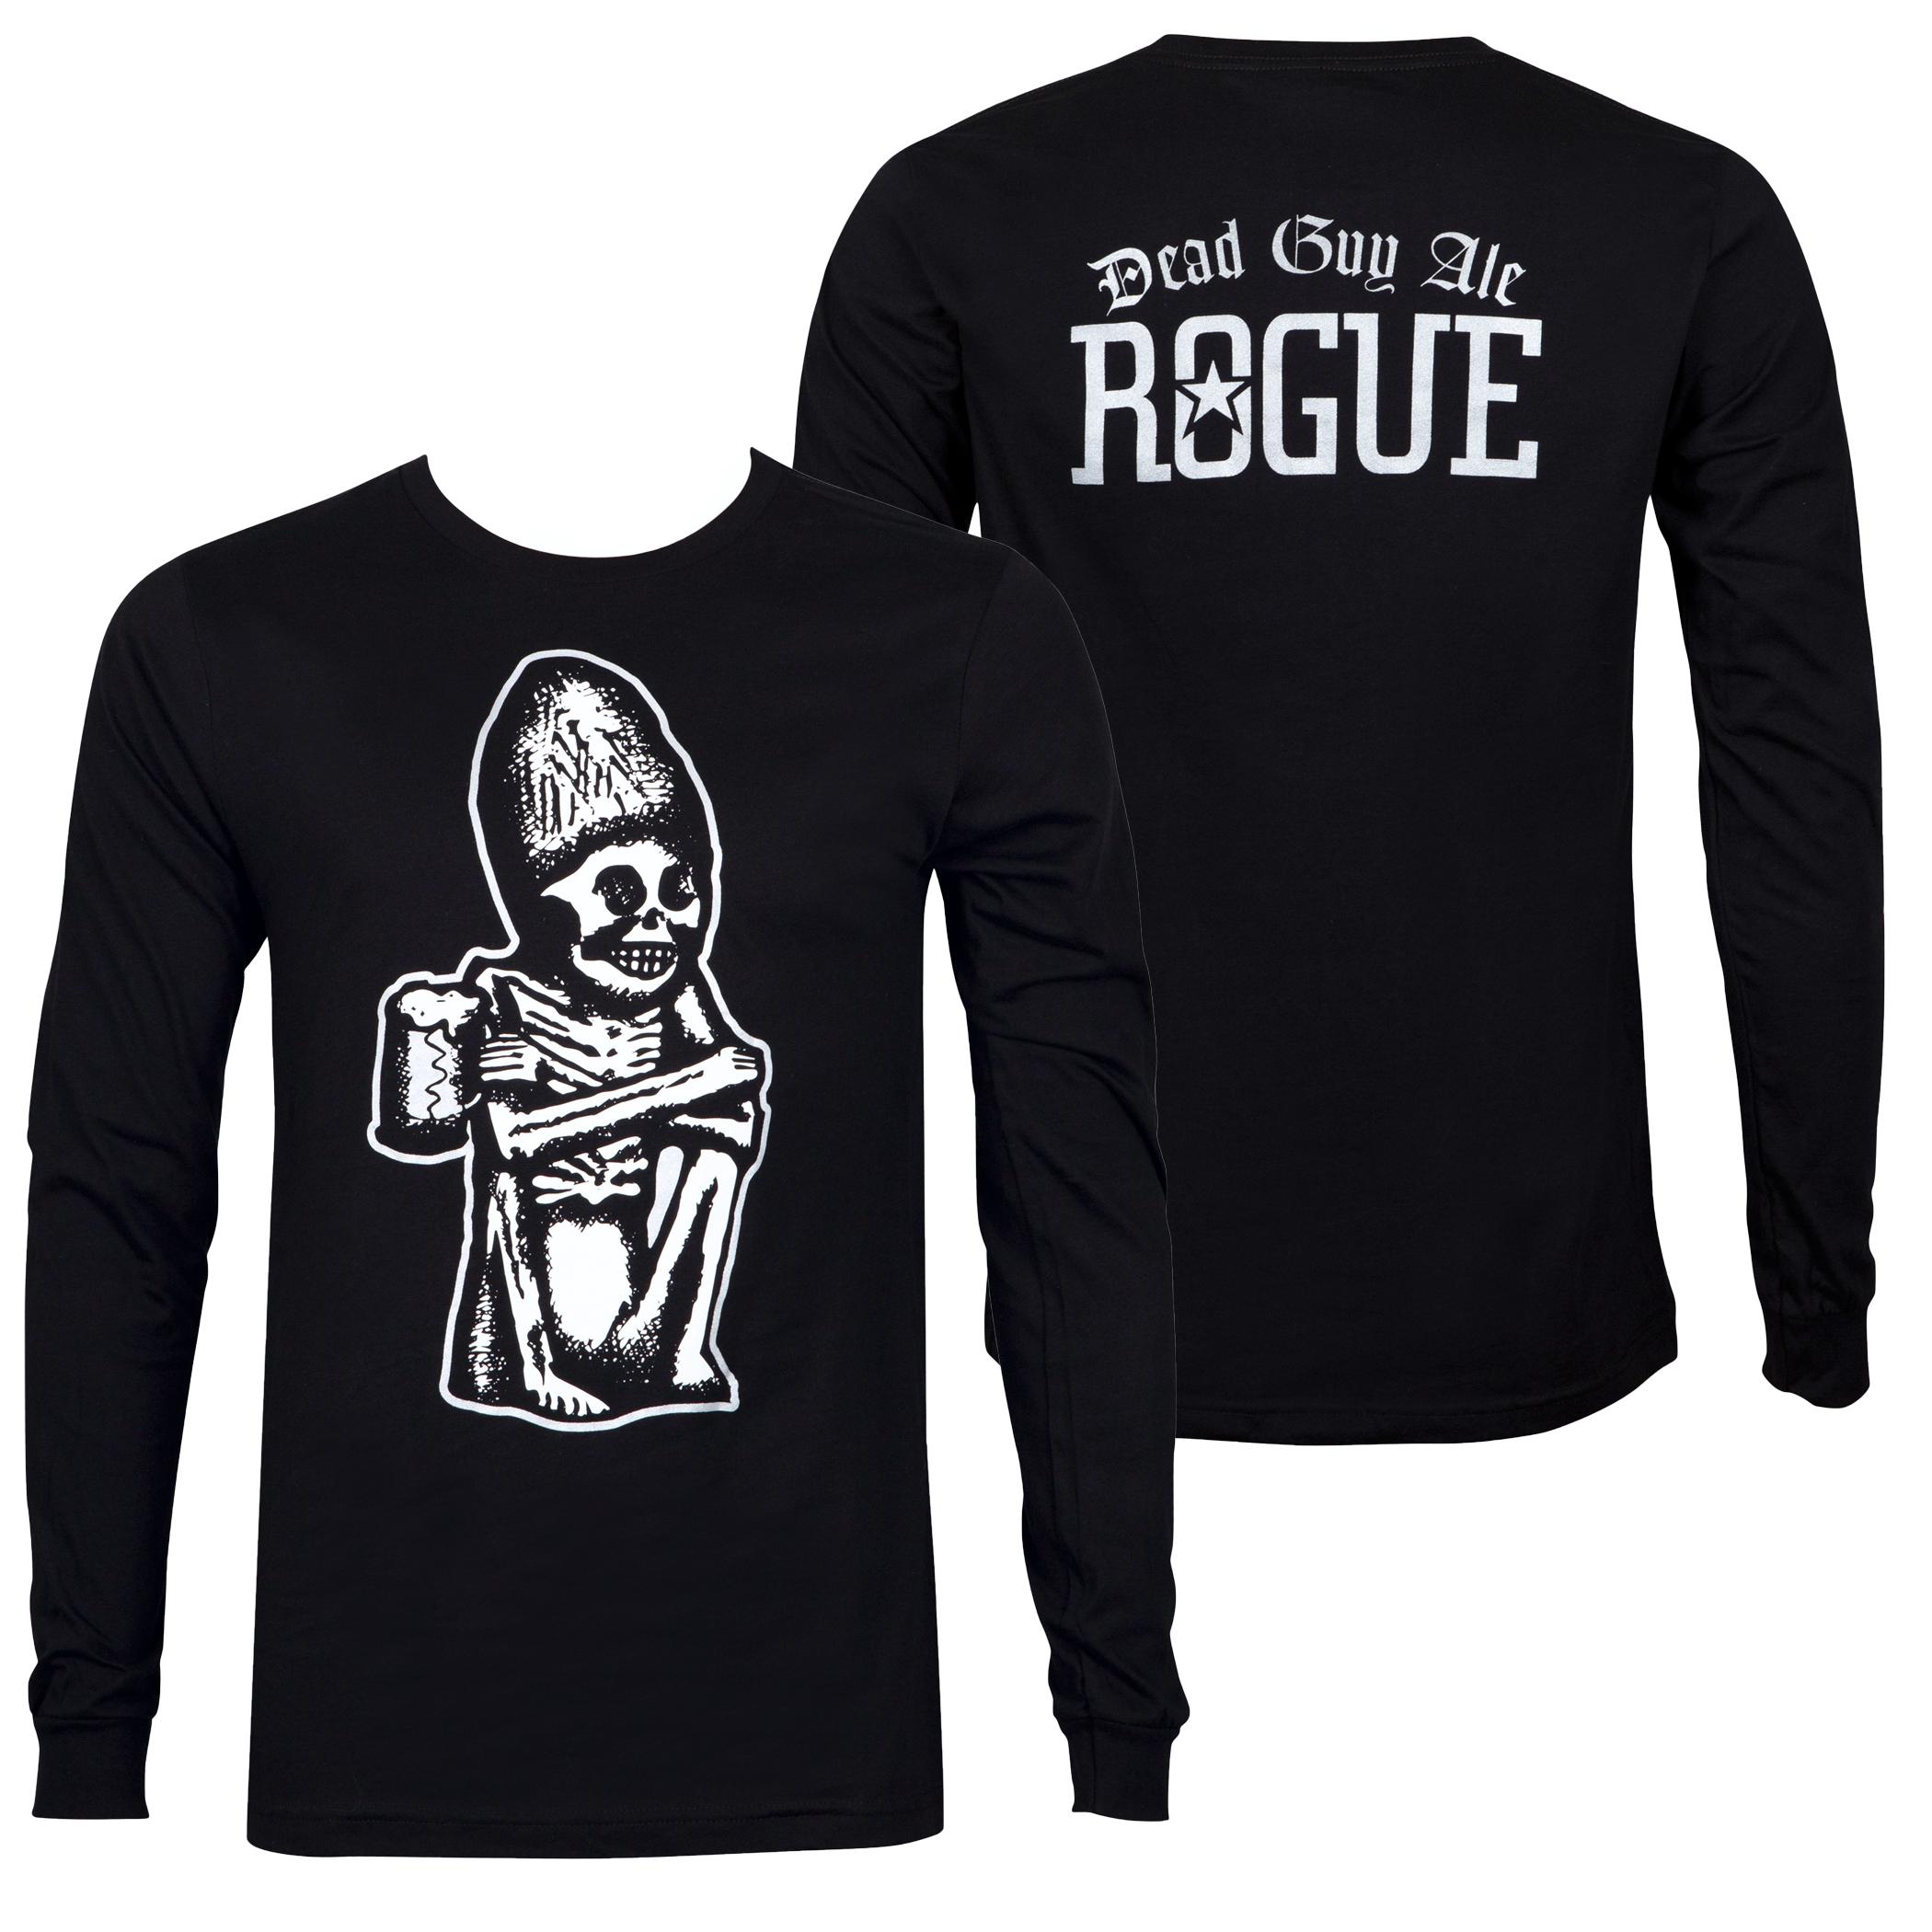 2aab64d0 Rogue Ale Dead Guy Ale Black Long Sleeve Tee Shirt